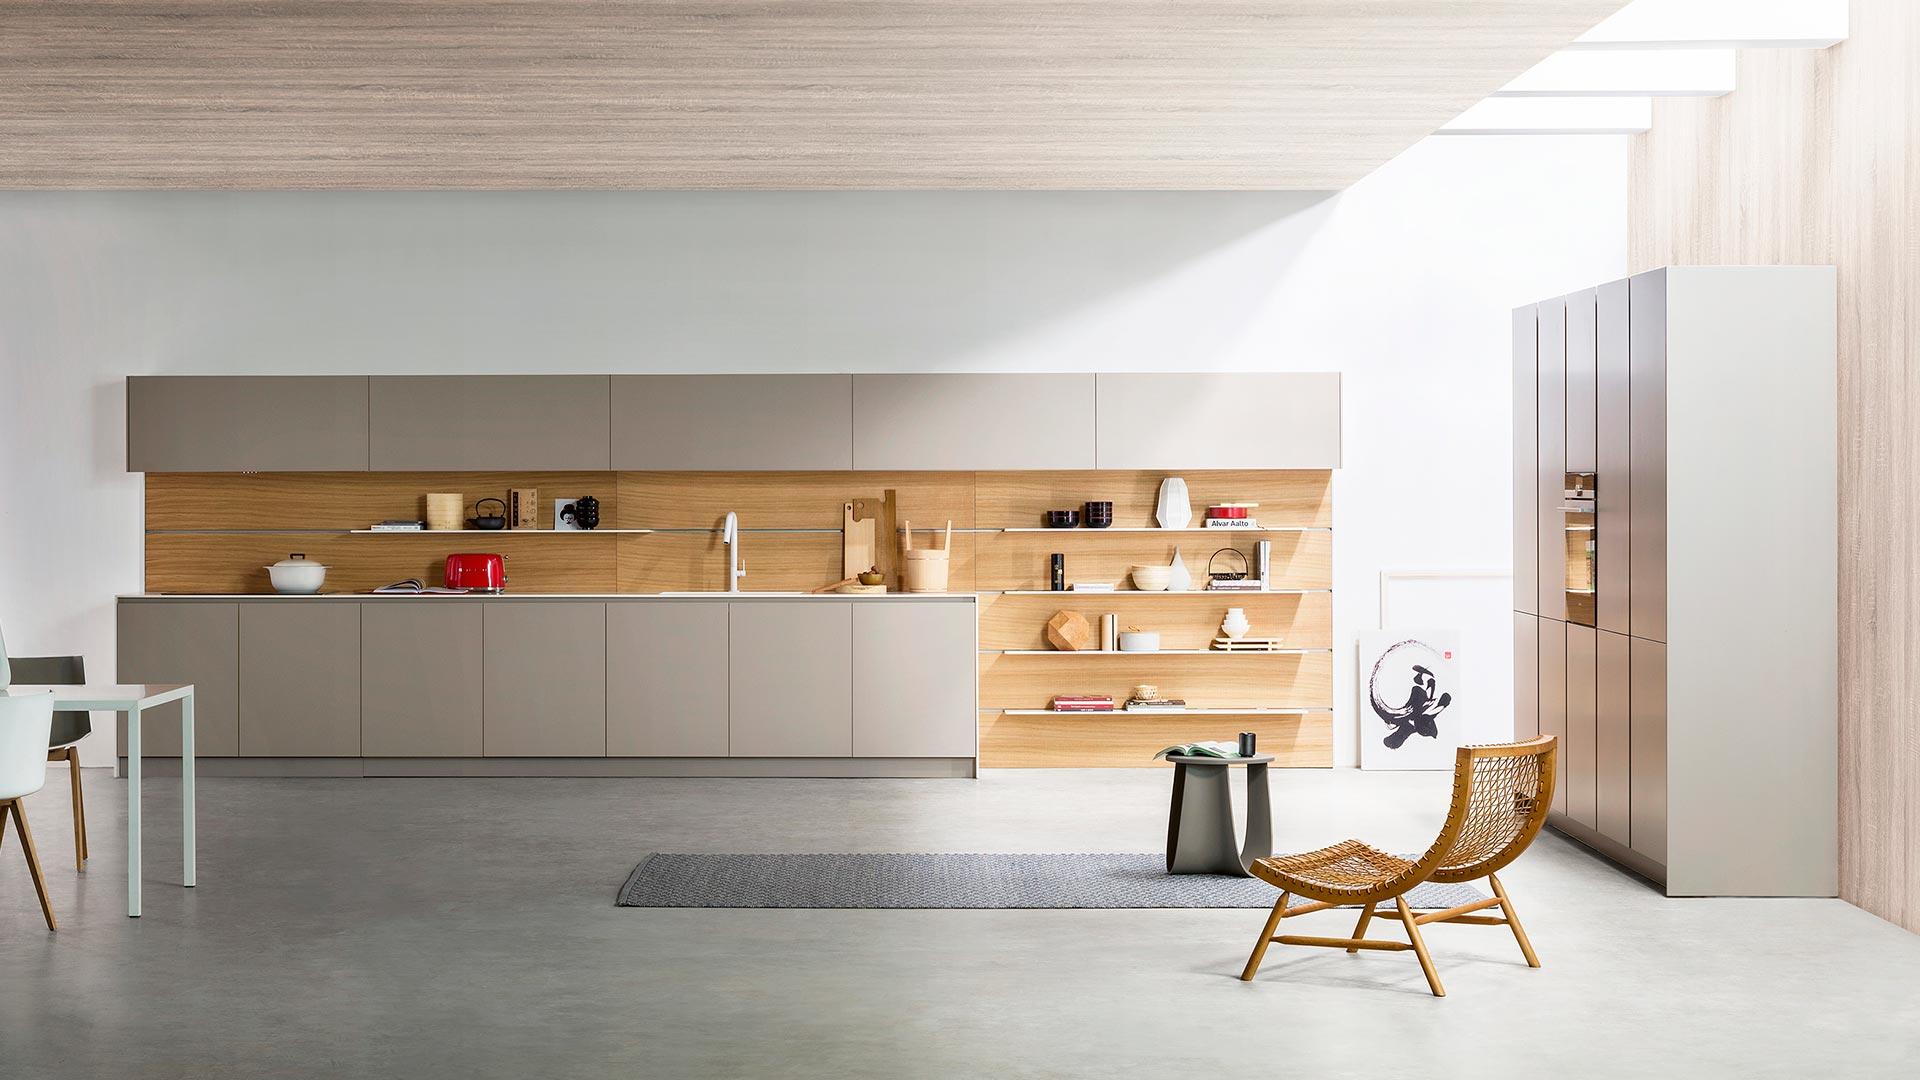 Cucina moderna freestanding in corian K6 | Collezioni Cucine 2018 TM Italia - TM_CAT_K6_001